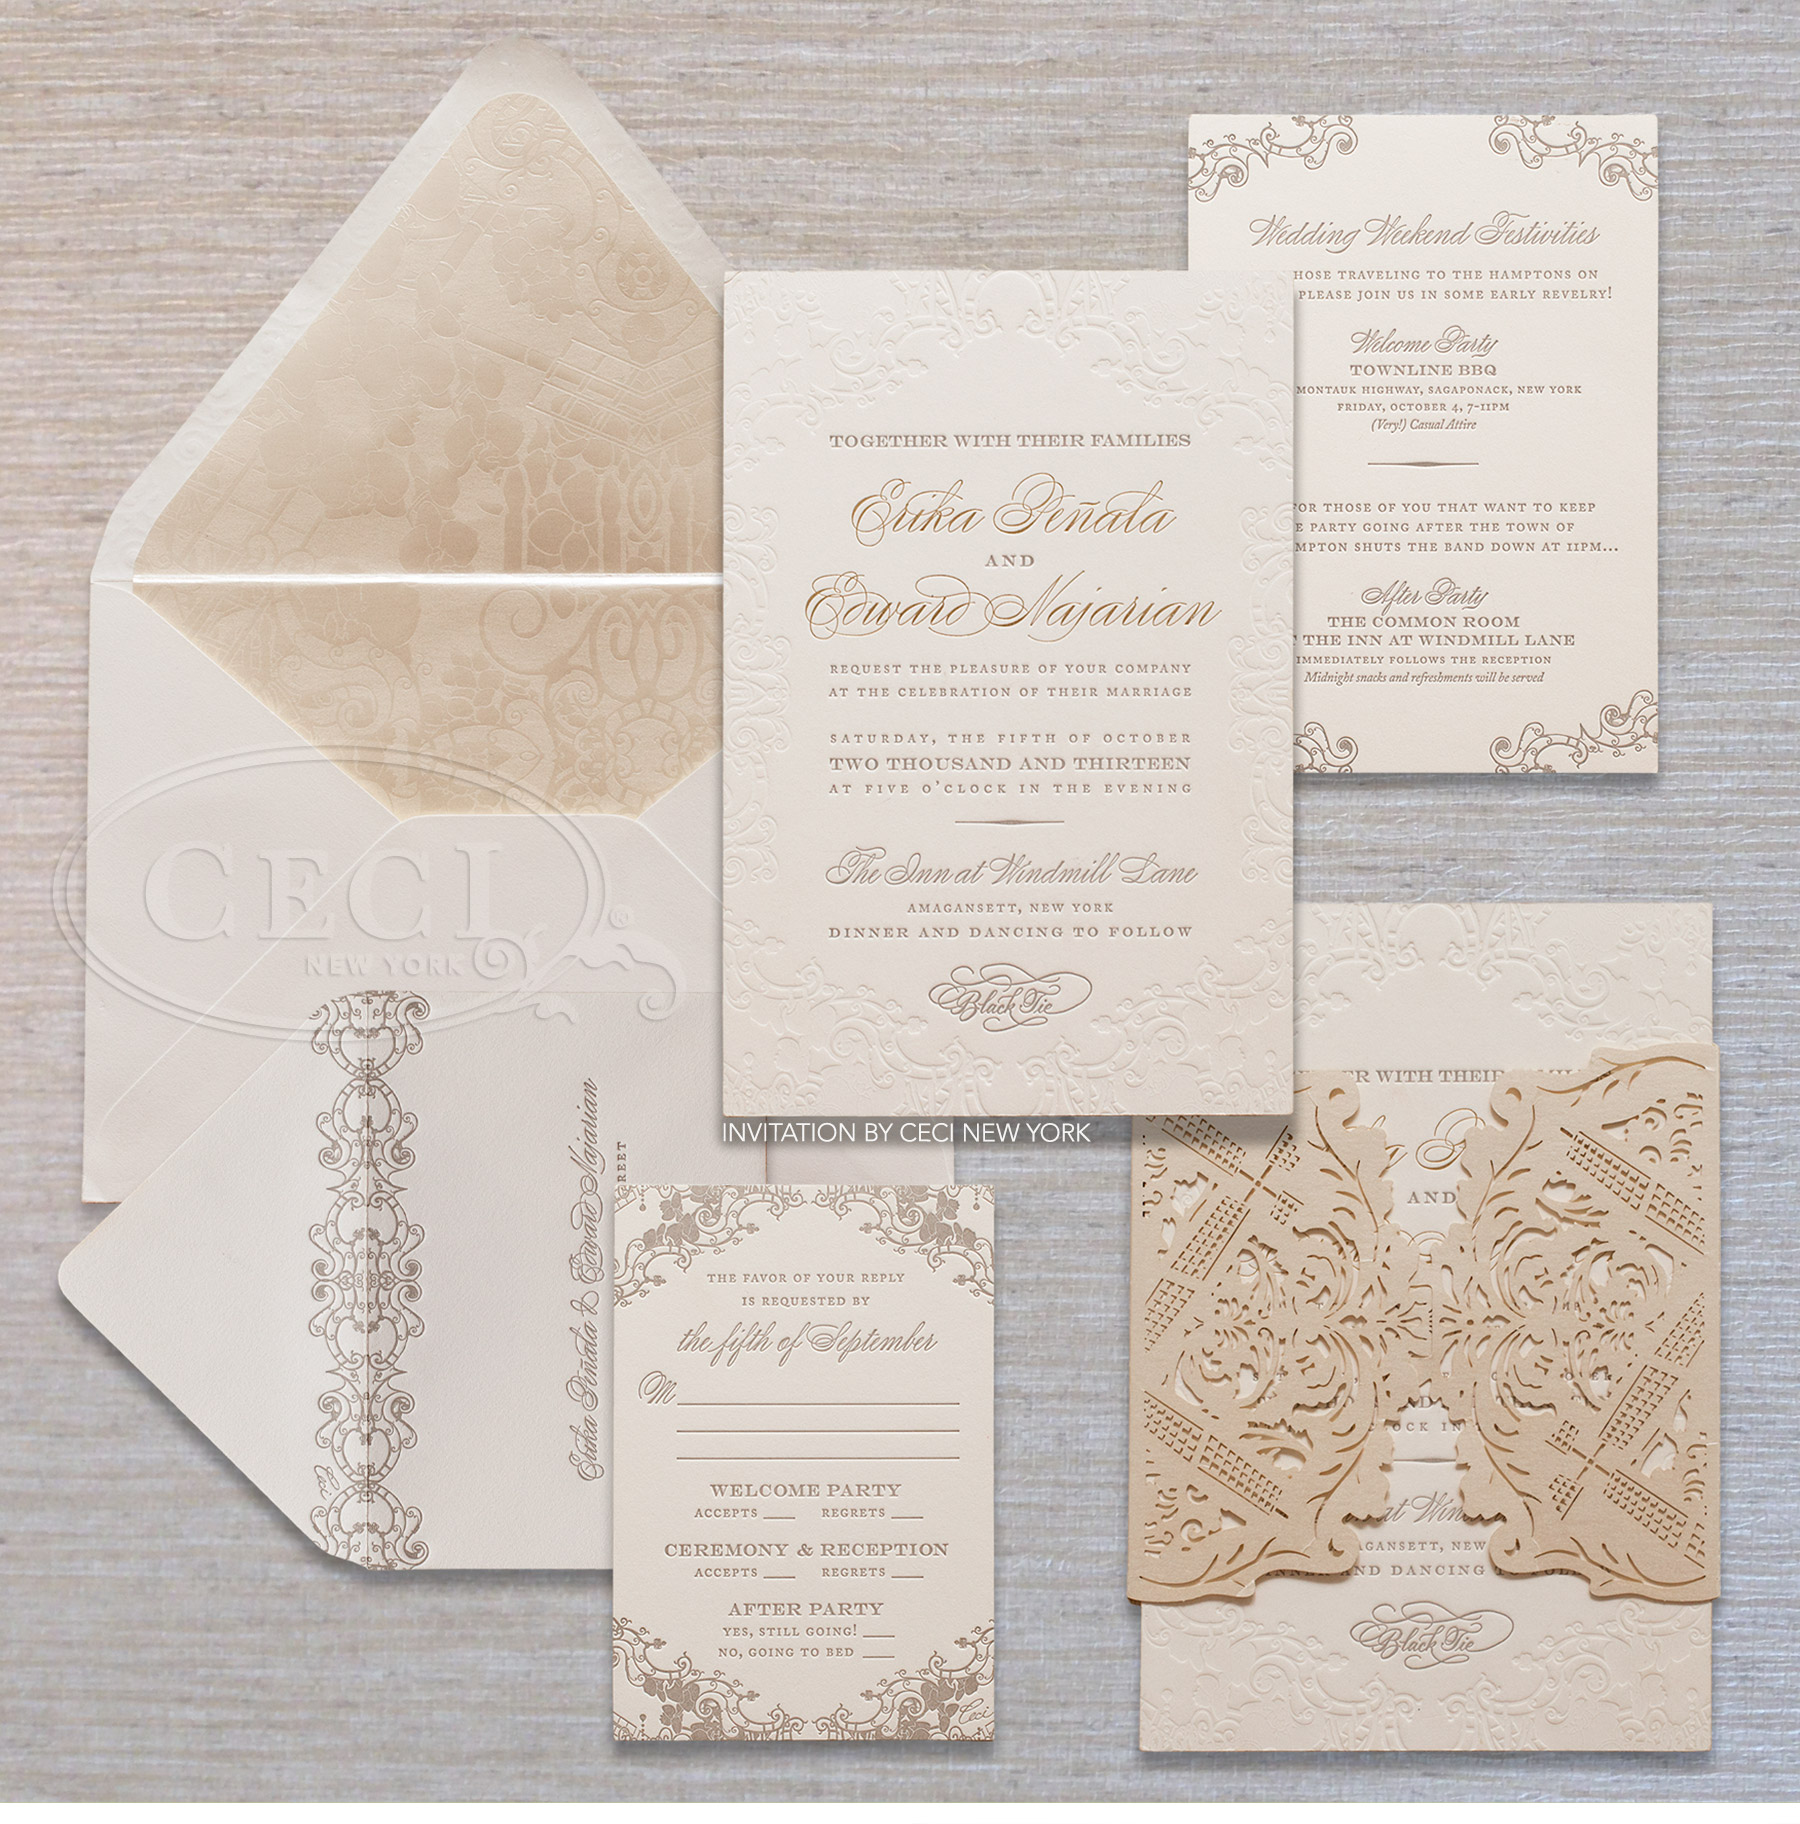 Luxury Wedding Invitations By Ceci New York: Ethereal Hamptons Wedding: Erika & Ed